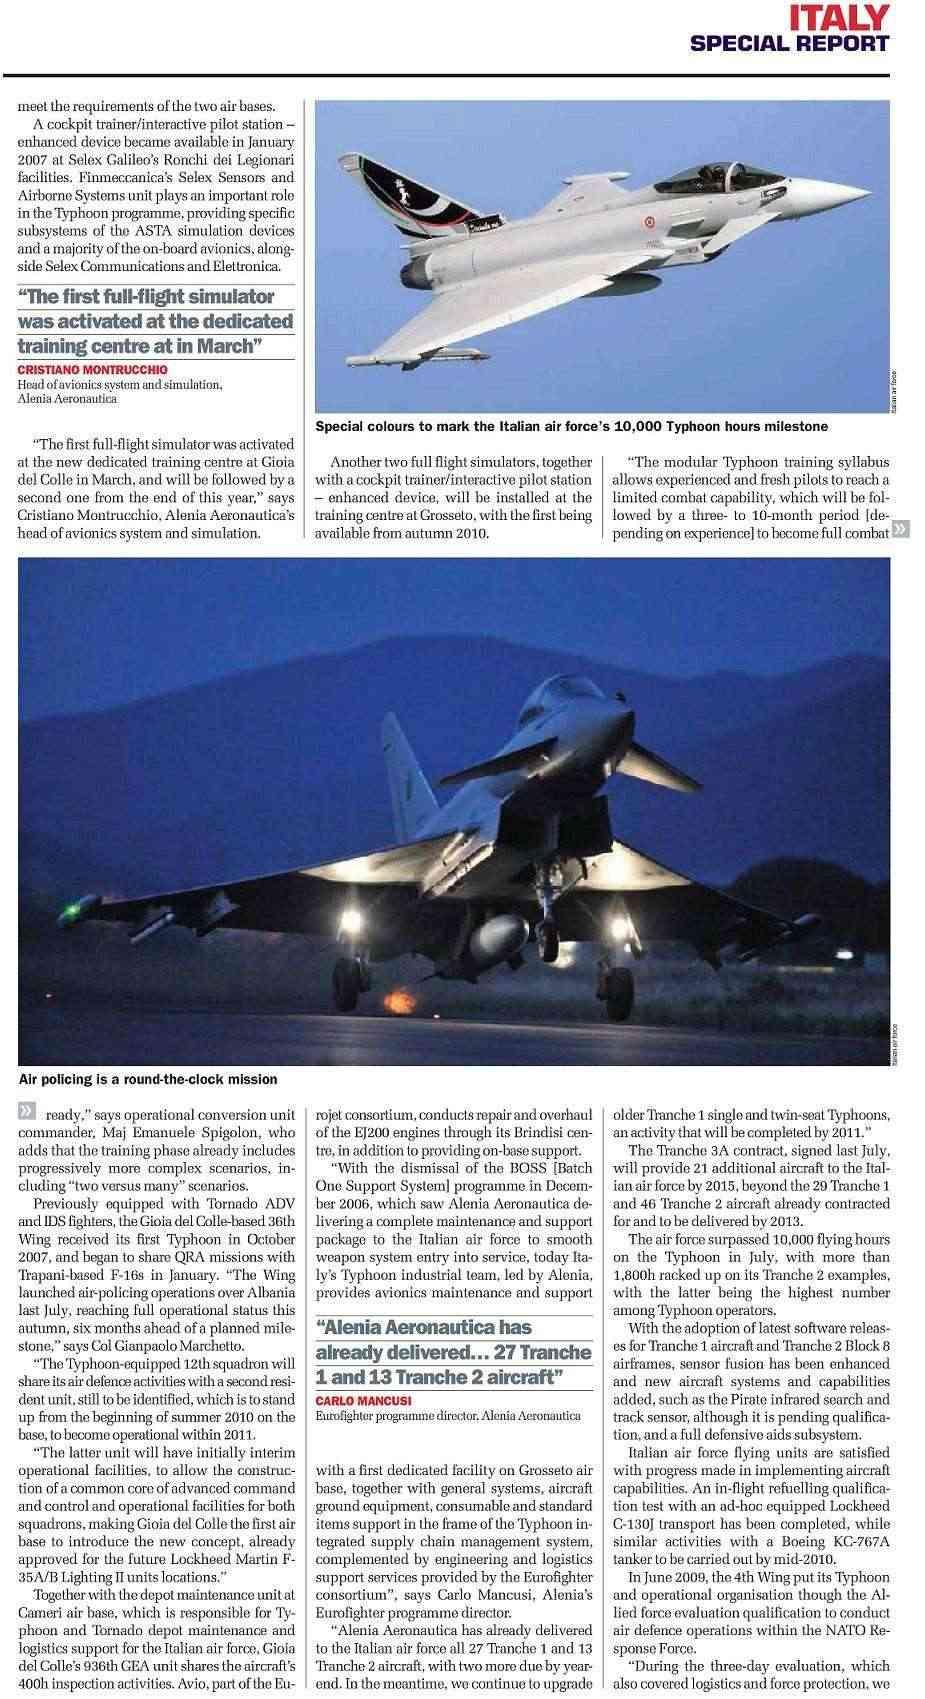 Armée Italienne/Forze Armate Italiane - Page 2 Italyq12